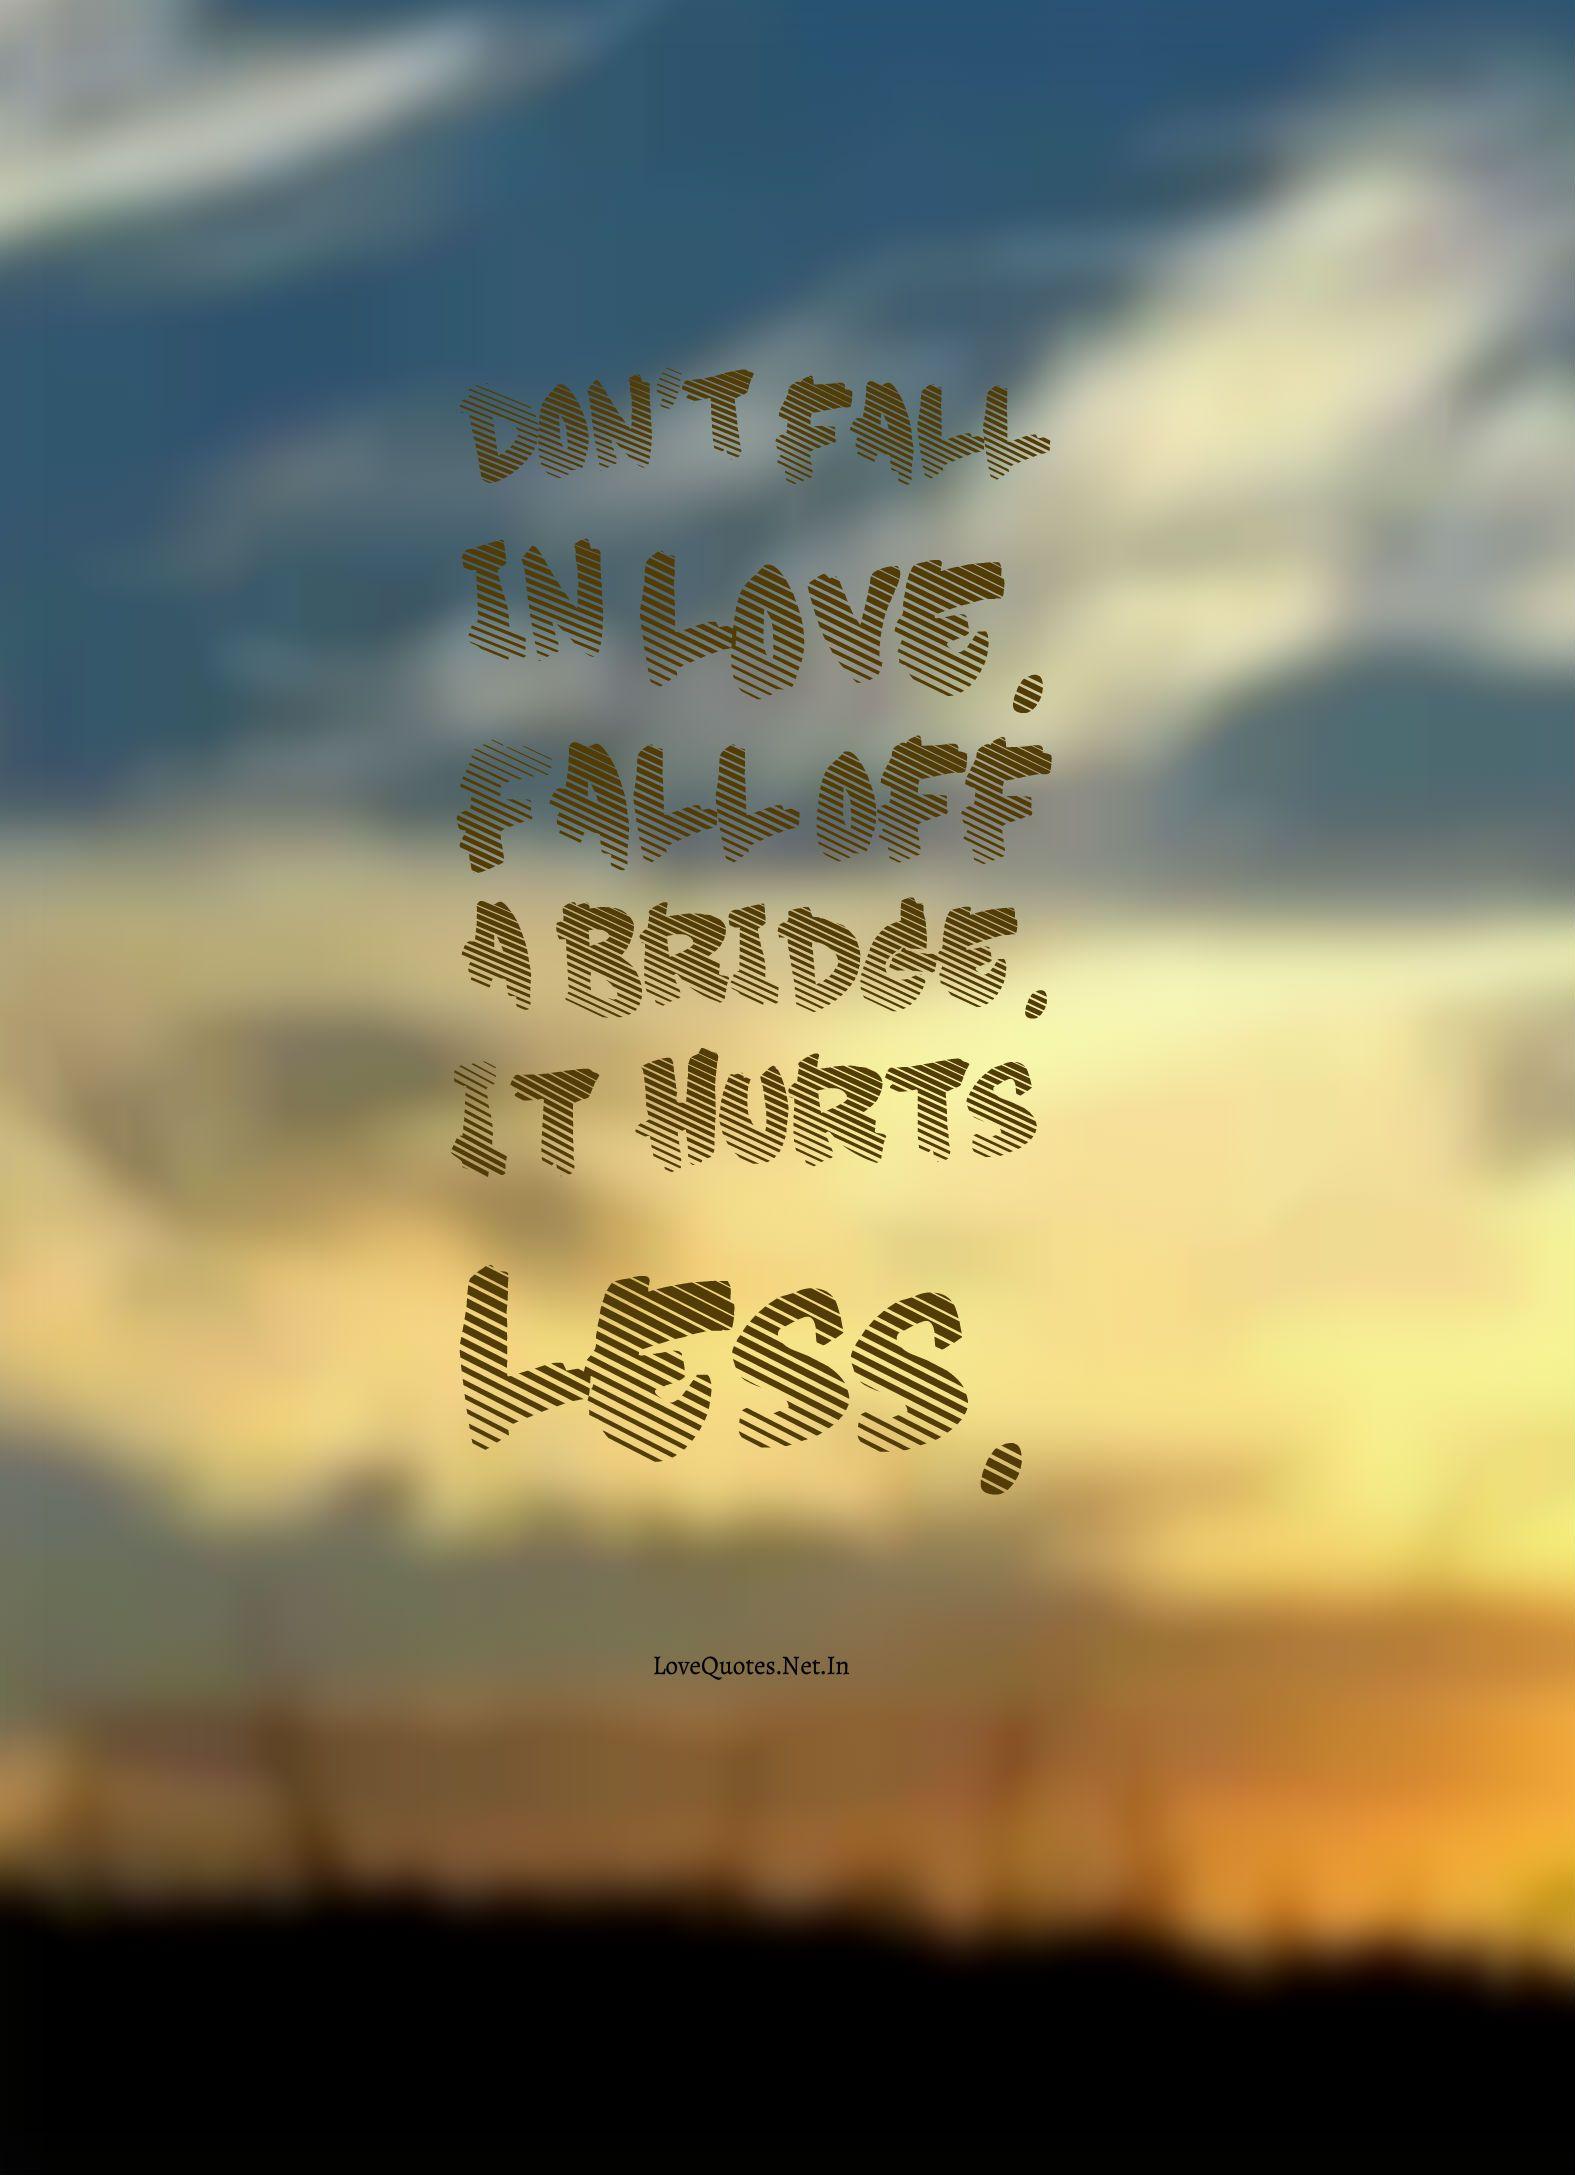 Love in Fall hurts fotos